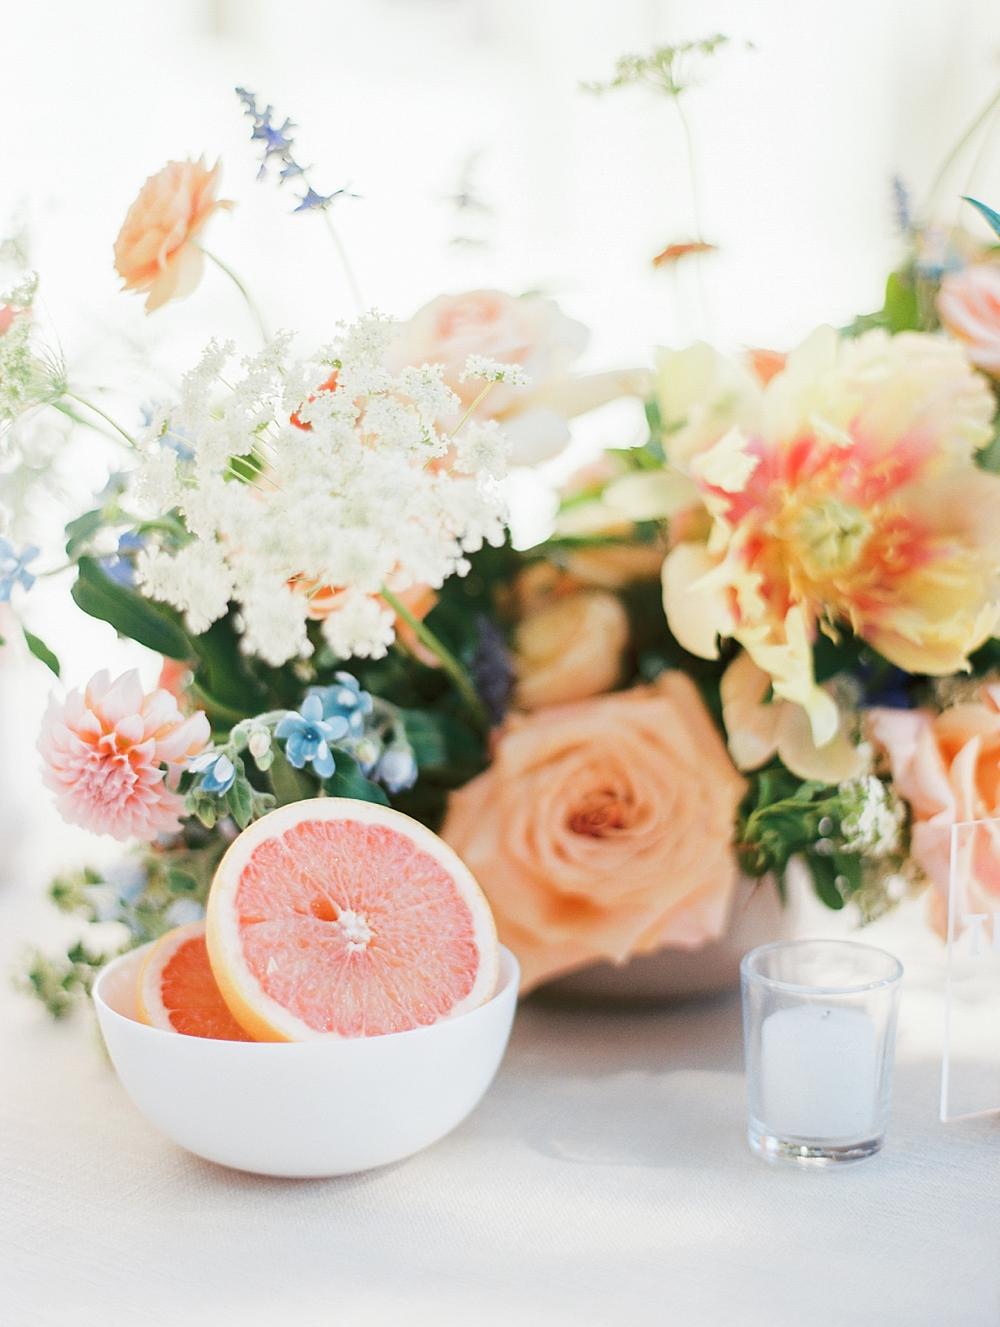 Kristin-La-Voie-Photography-Austin-Wedding-Photographer-the-grand-lady-2